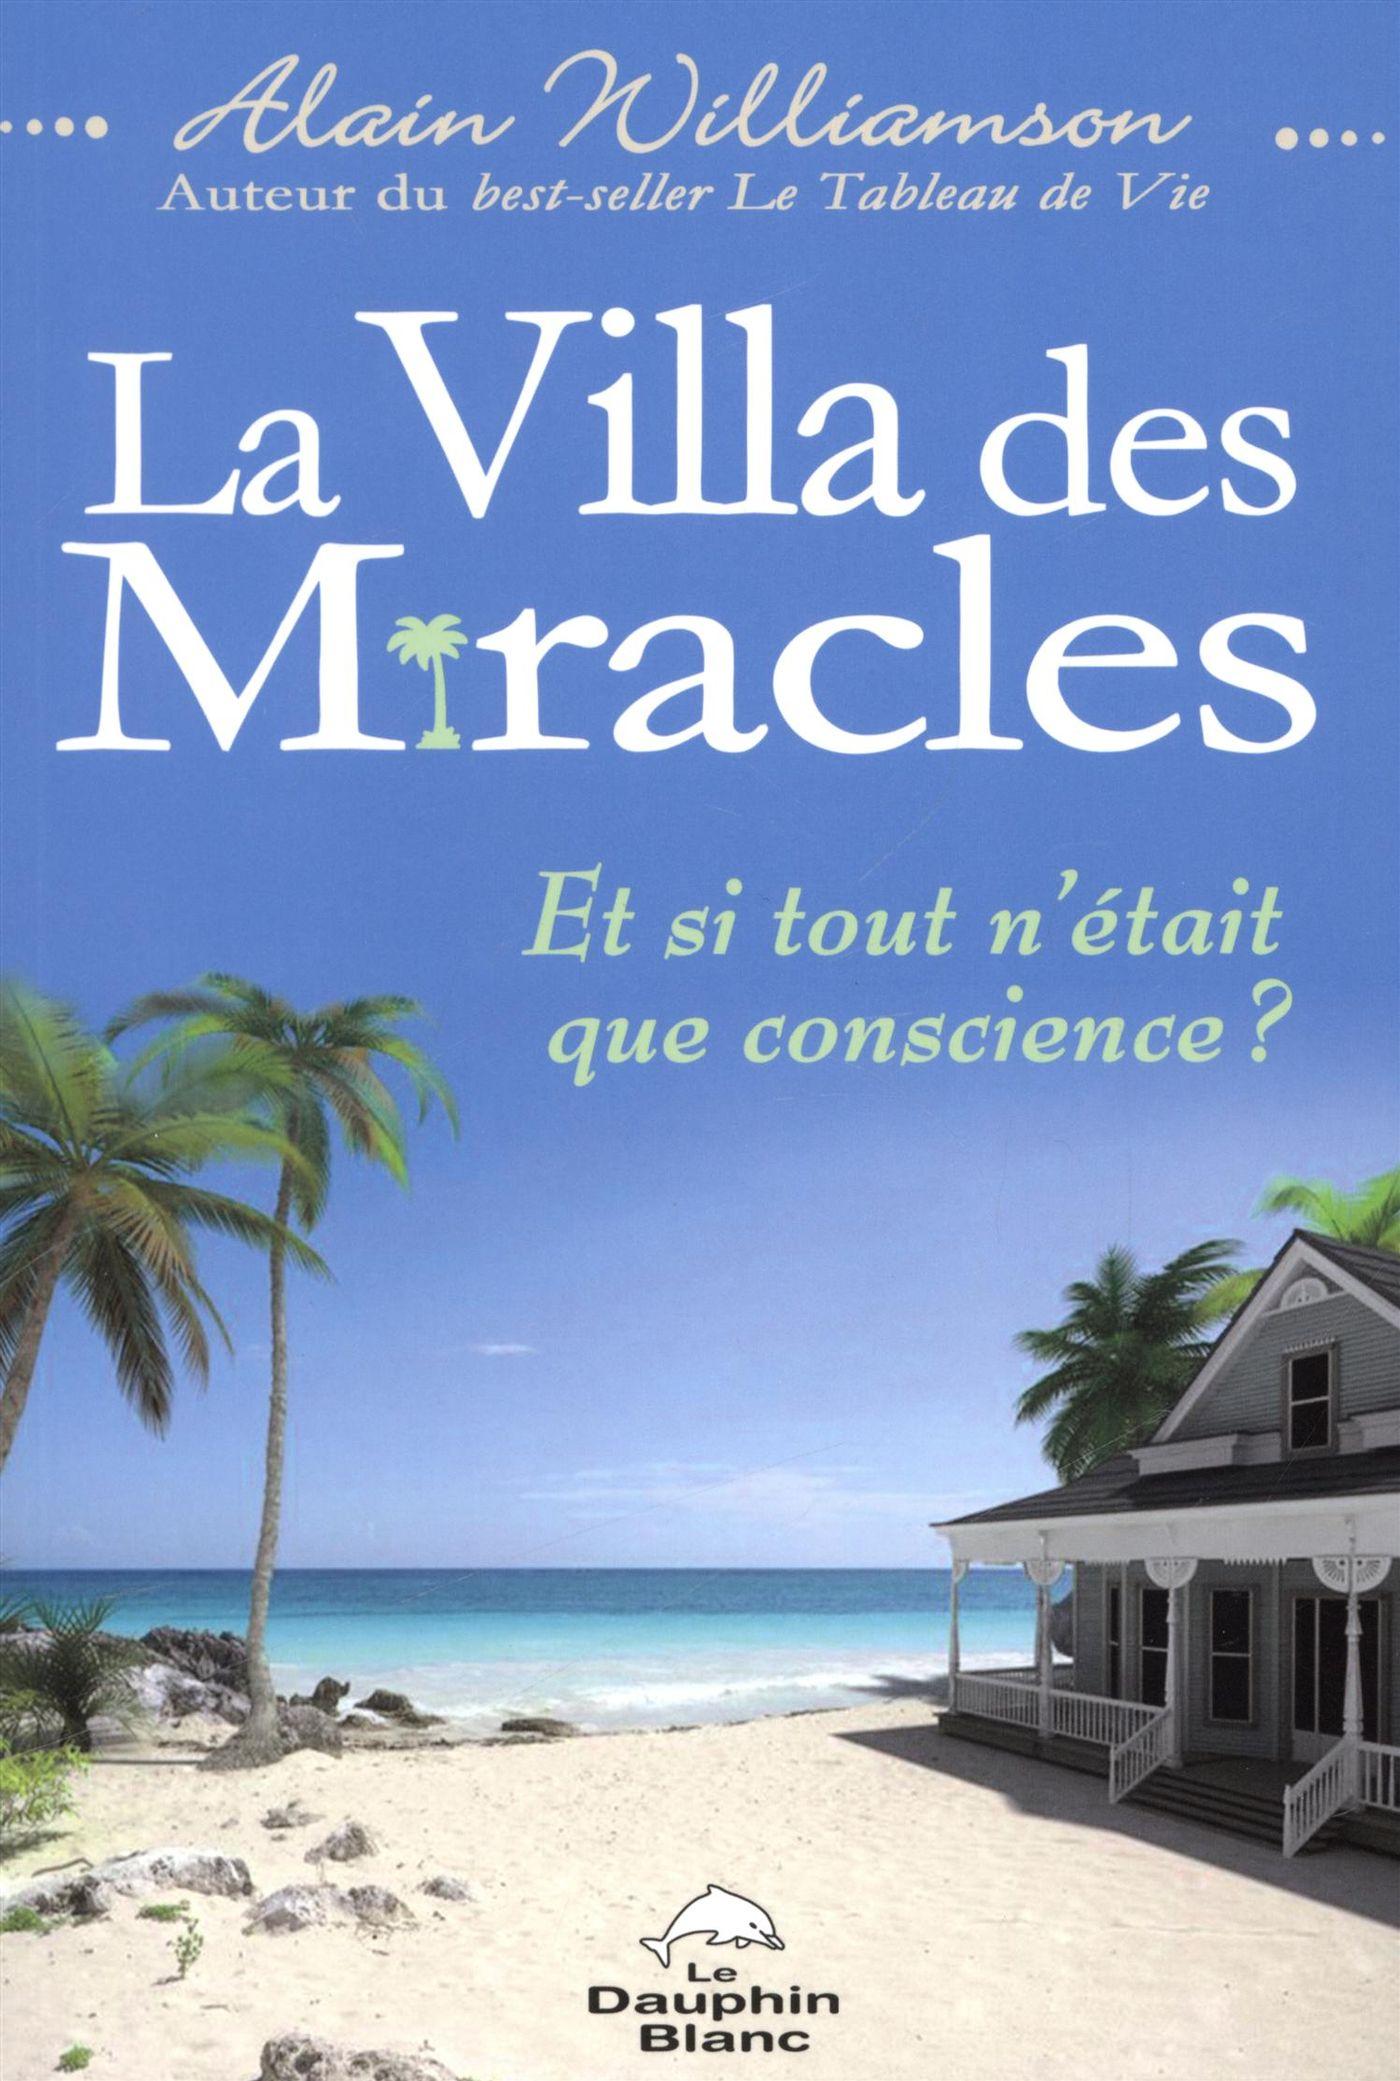 La Villa des miracles - Et ...